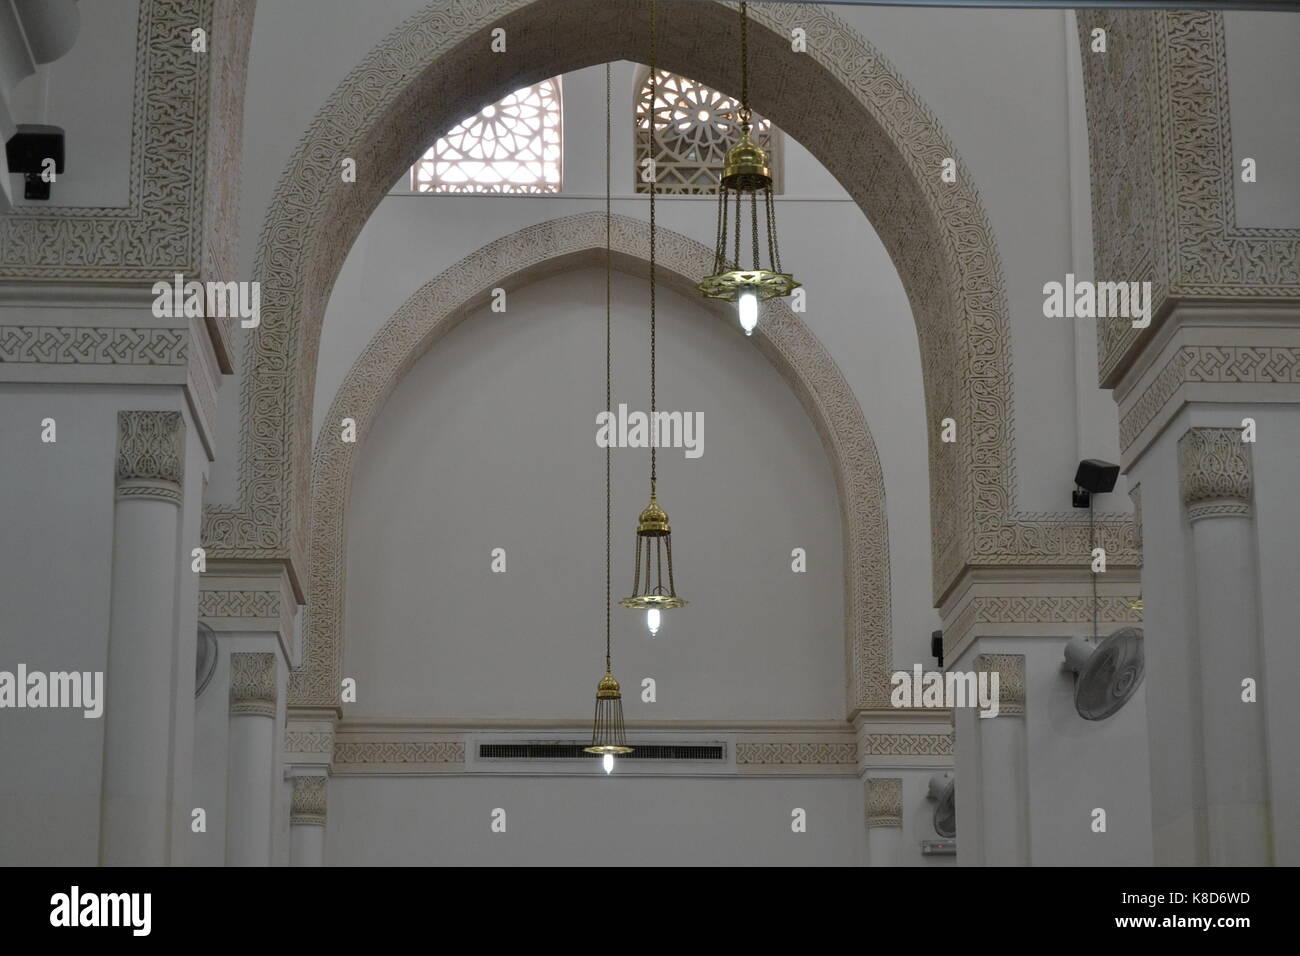 Quba mosque lamp symmetry - Stock Image